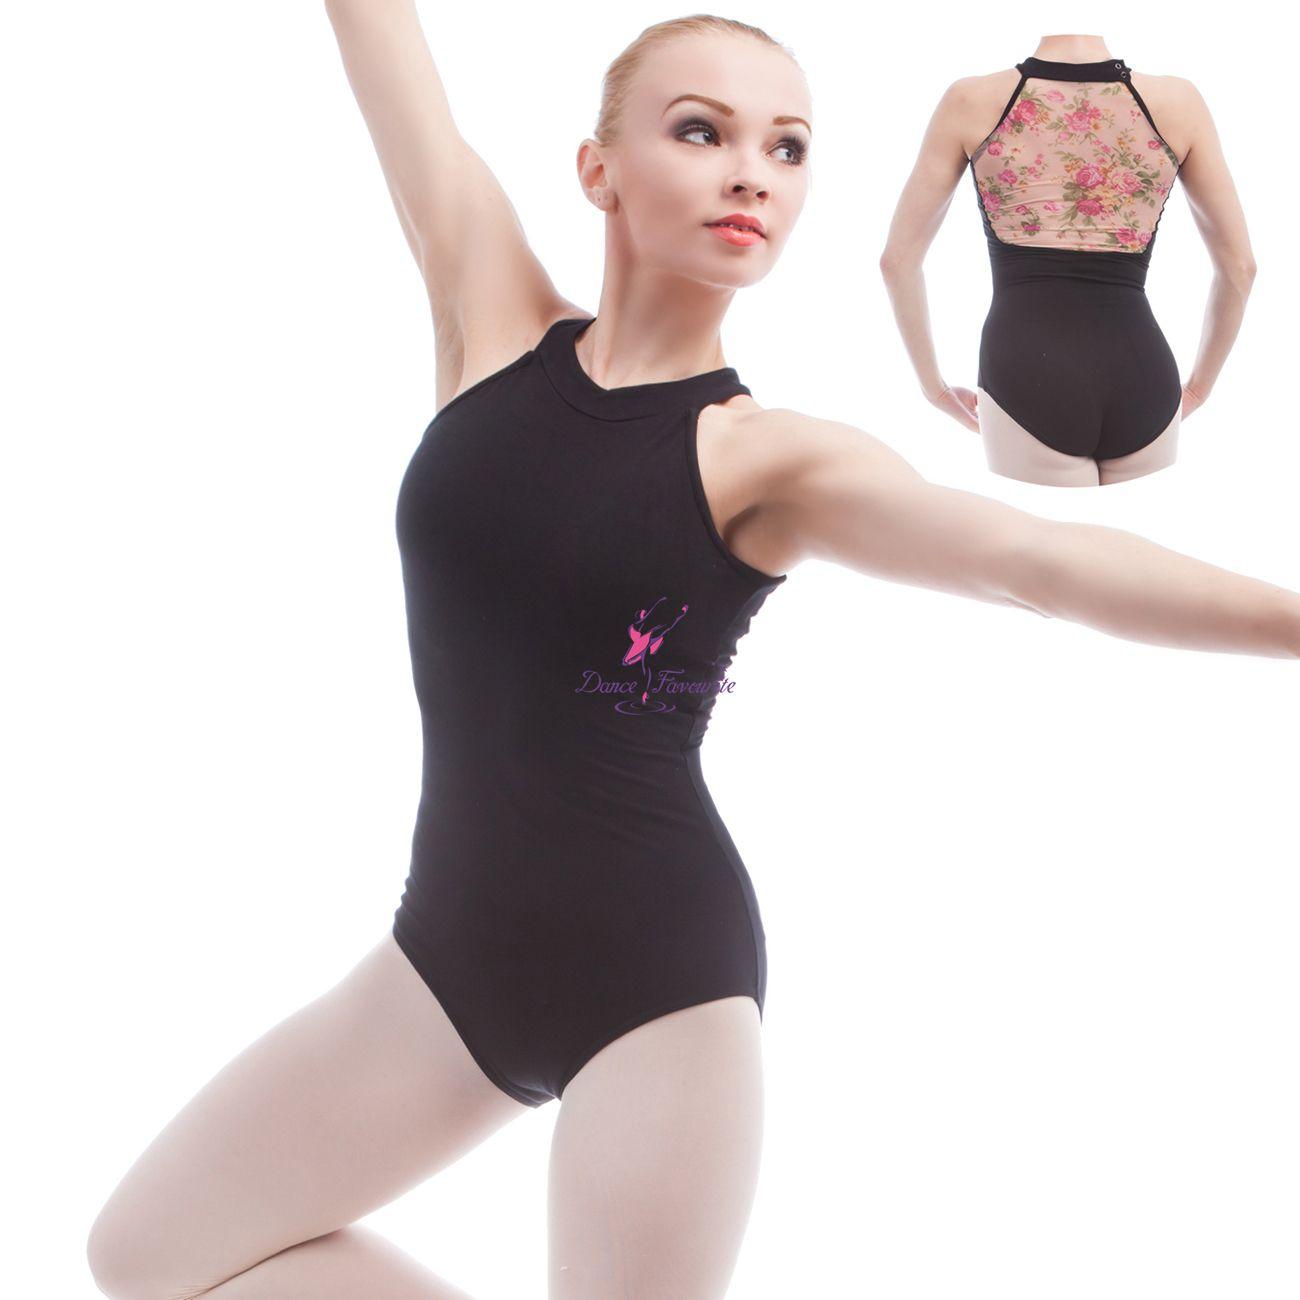 947332e44182 2019 Flower Printed Mesh & Cotton Ballet Leotards For Women Ballet  Dancewear Adult Dance Practice Clothes Gymnastics Leotards 01D0015 From ...